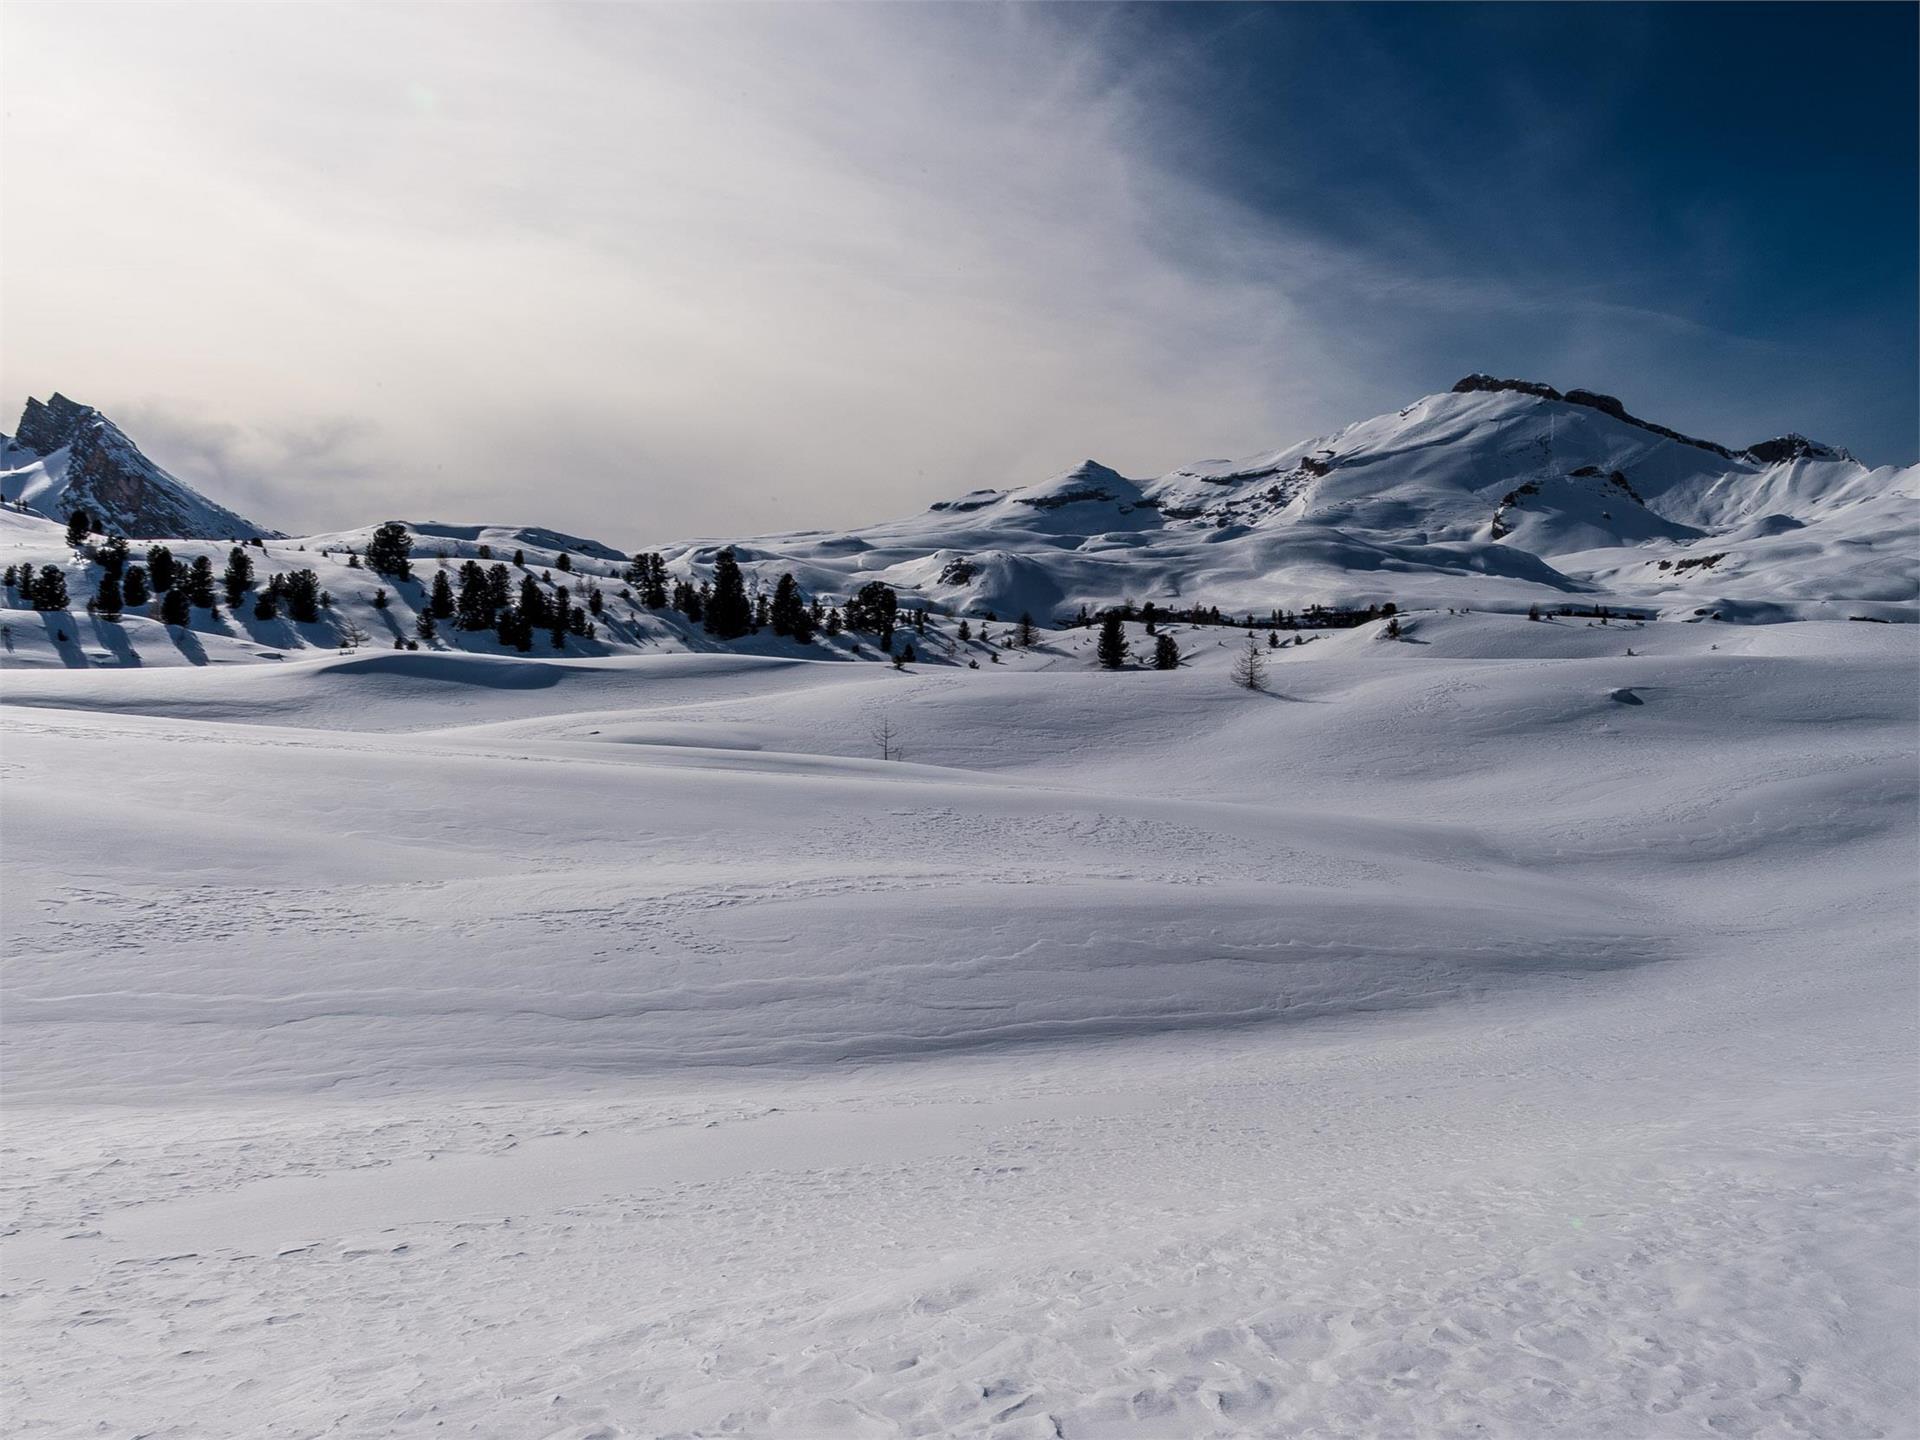 Leichte Schneeschuhwanderung im Naturpark Fanes-Senes-Prags